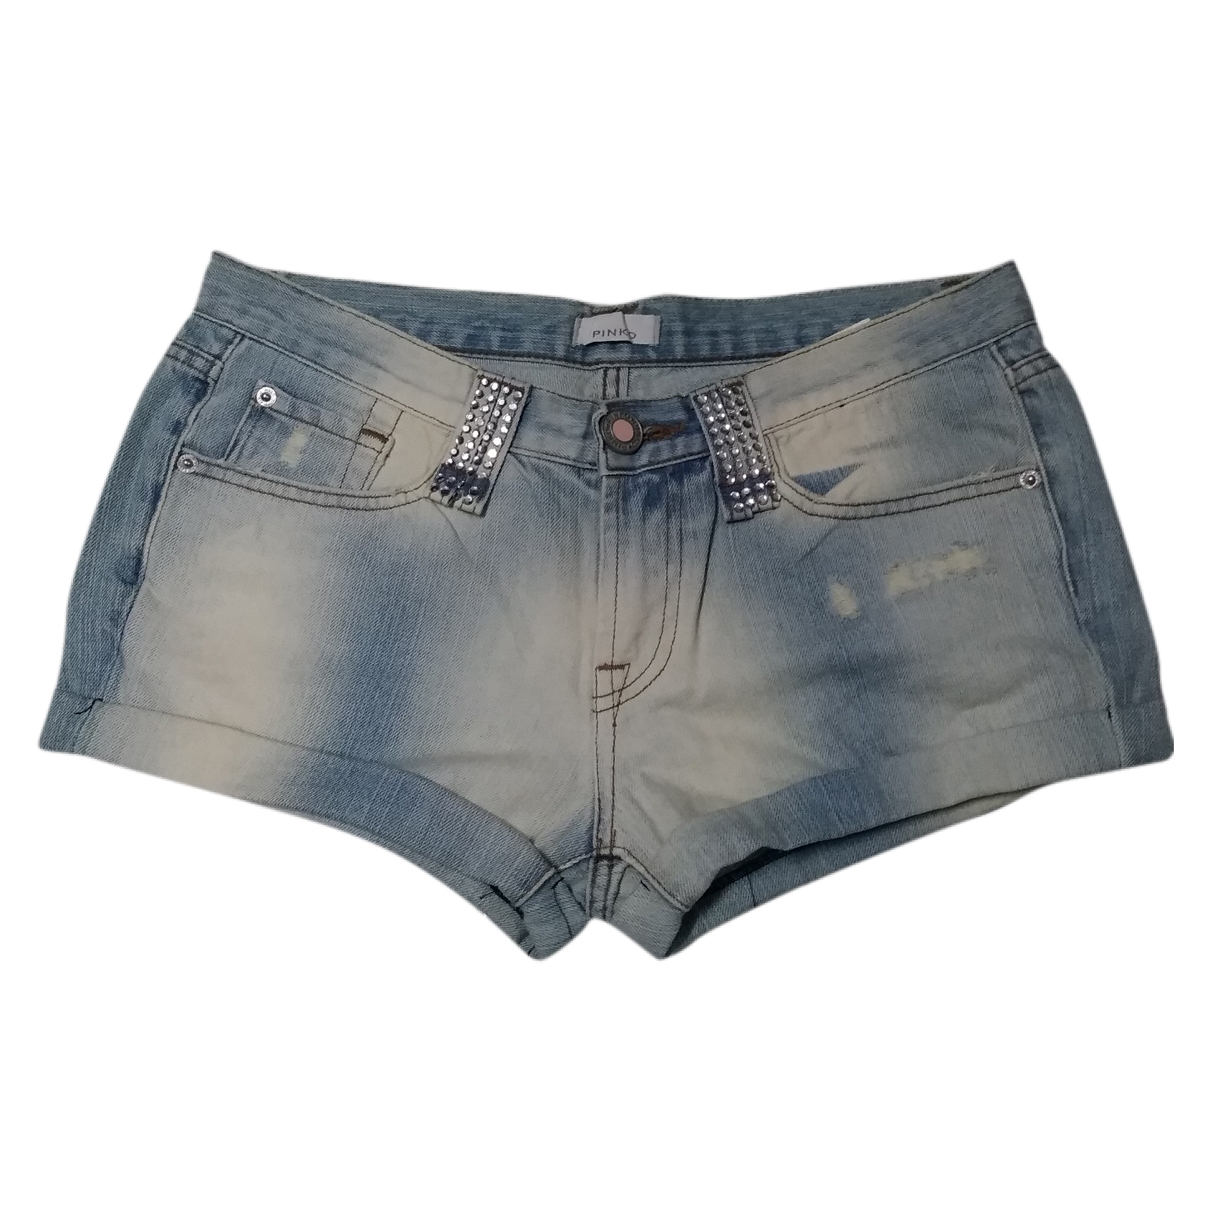 Pinko \N Shorts in Denim - Jeans